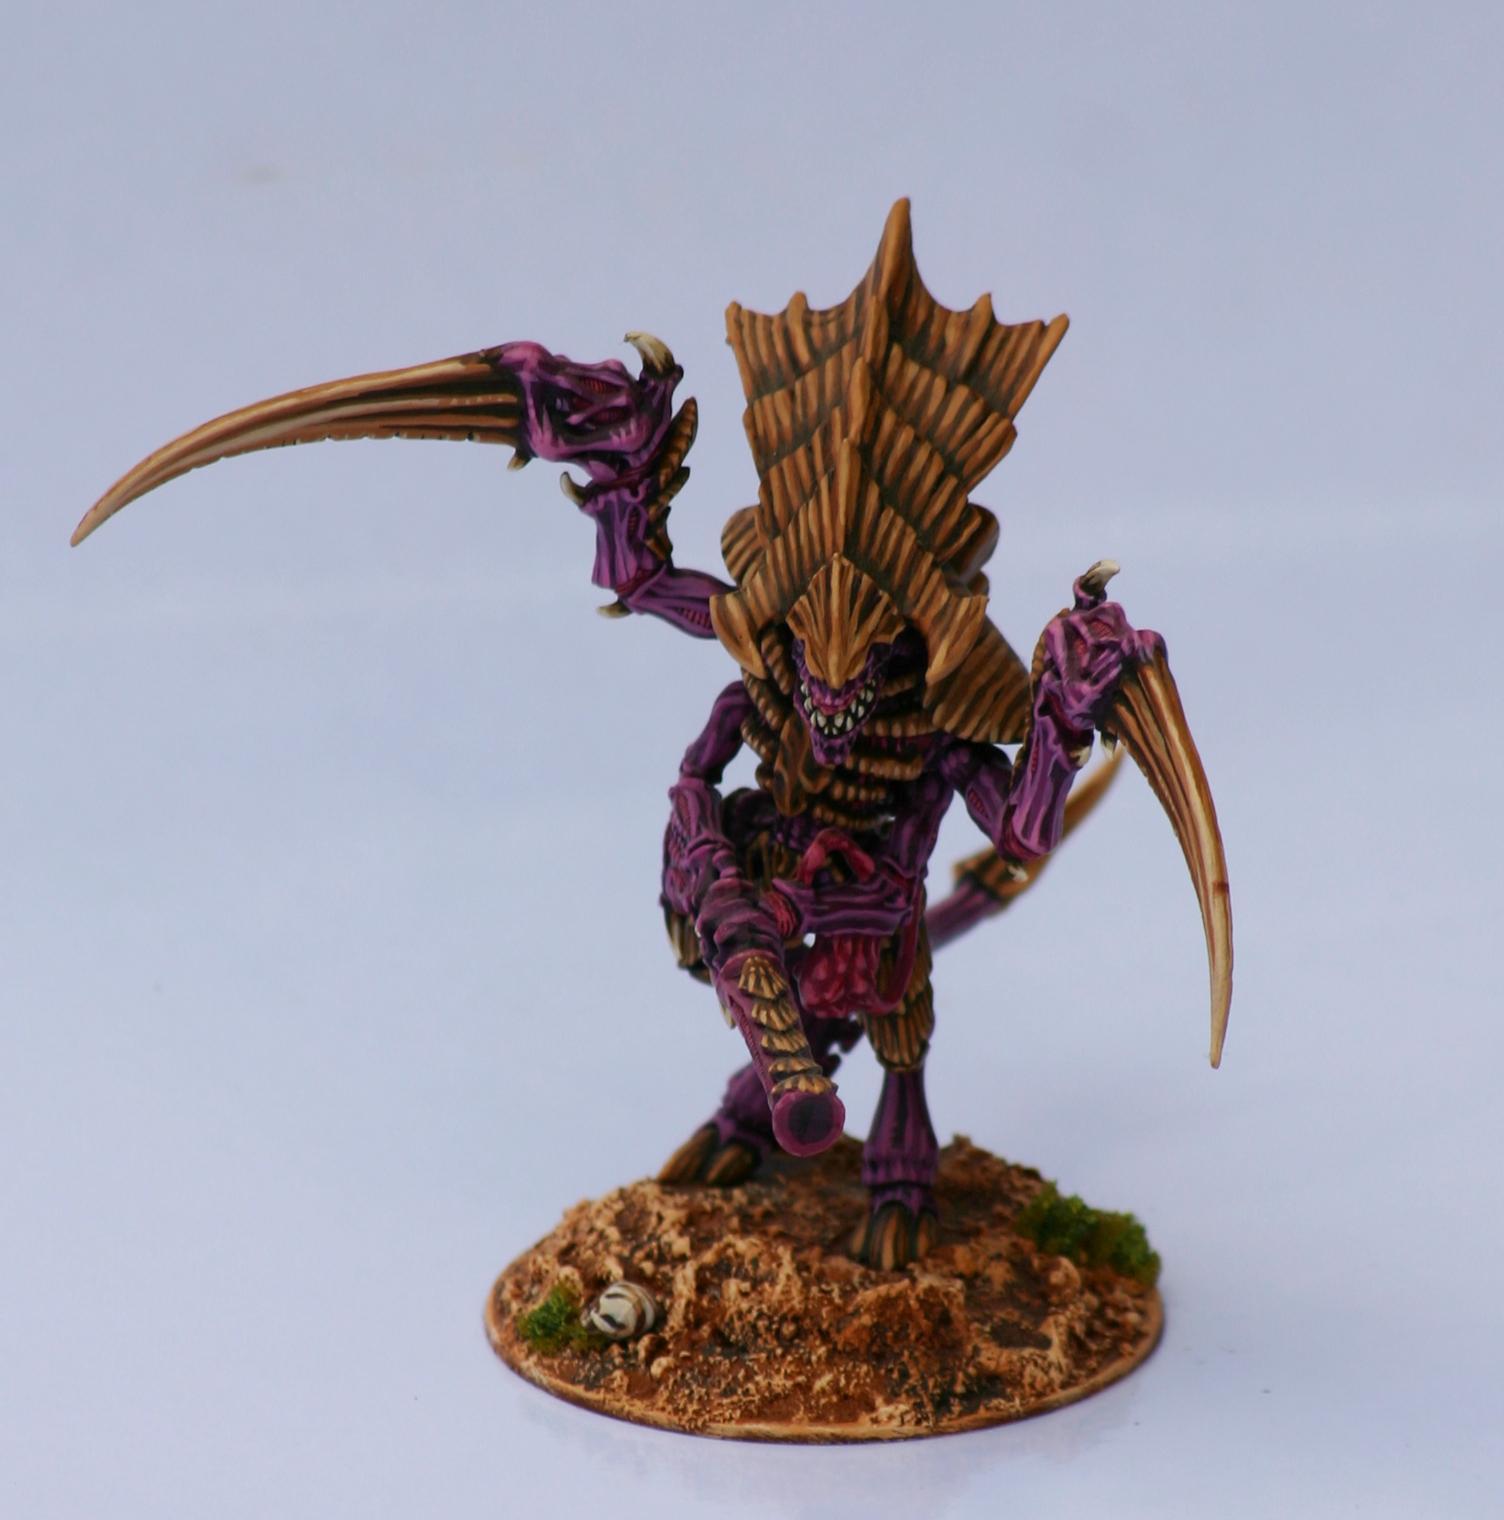 Hive Tyrant, Tyranids, Warhammer 40,000